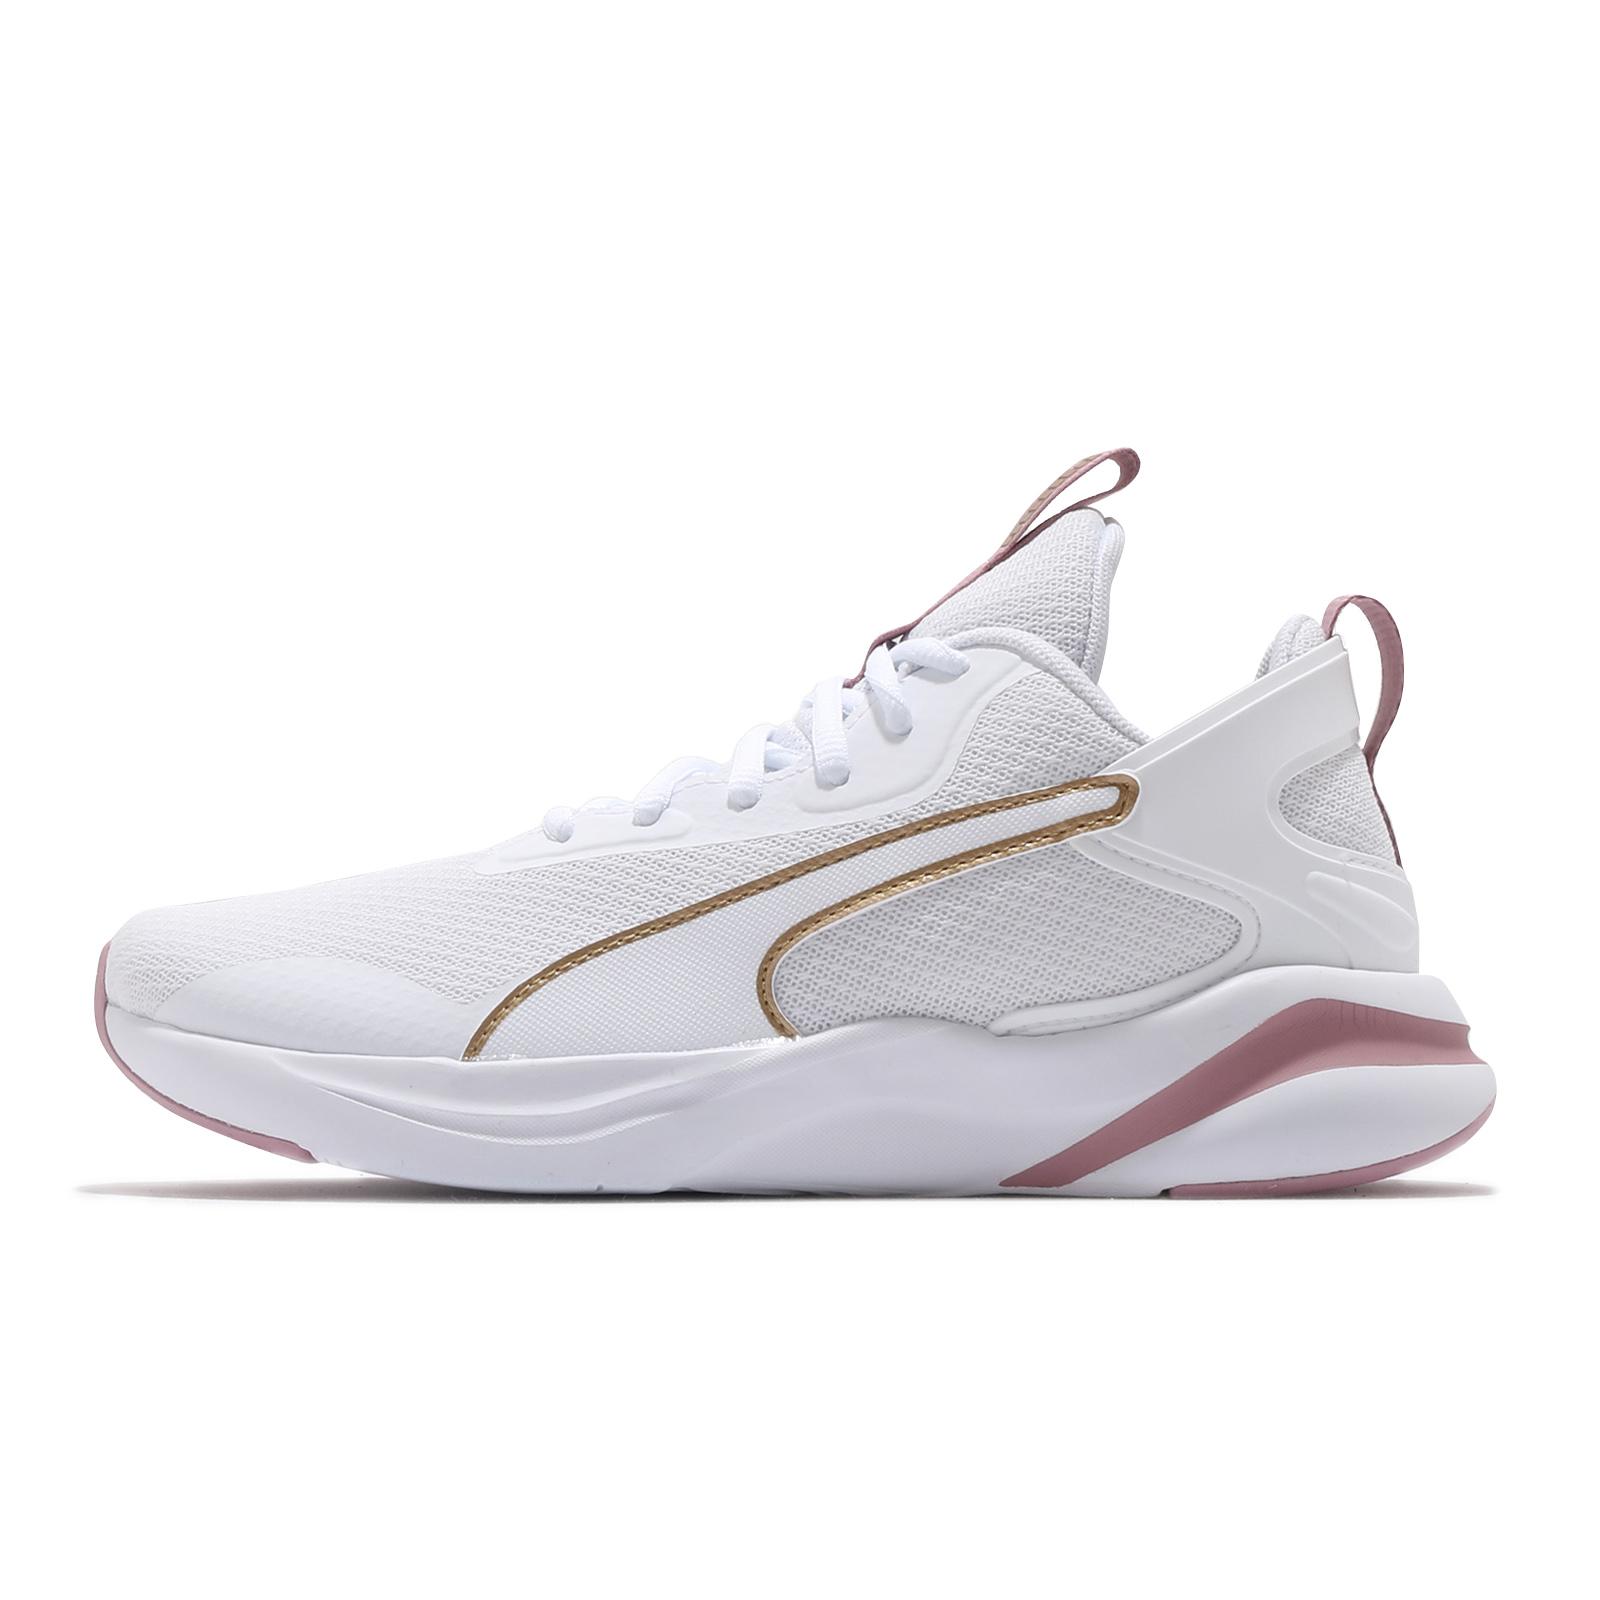 Puma 慢跑鞋 Softride Rift 白 金 粉紅 女鞋 輕量避震 運動鞋 【ACS】 19373903